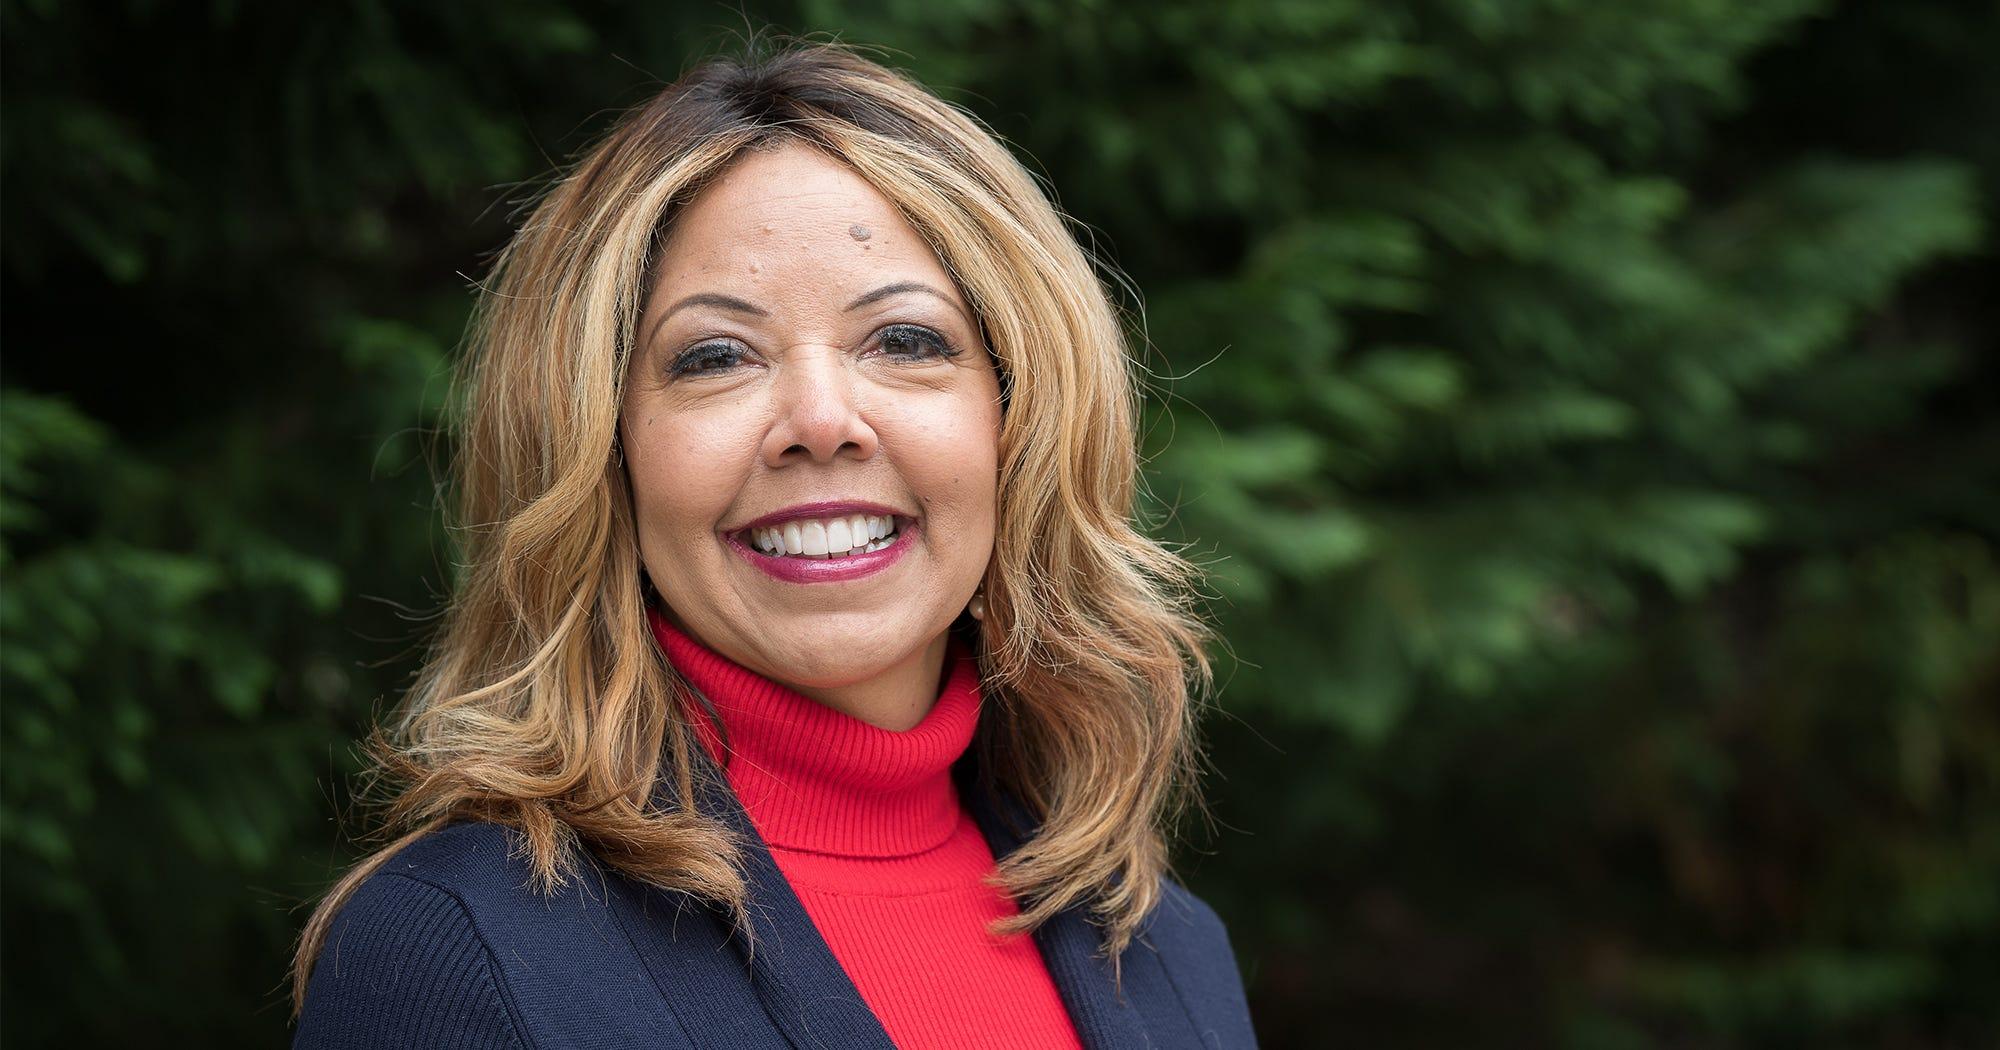 Gun Reform Advocate Lucy McBath Defeats NRA Darling Karen Handel In Georgia